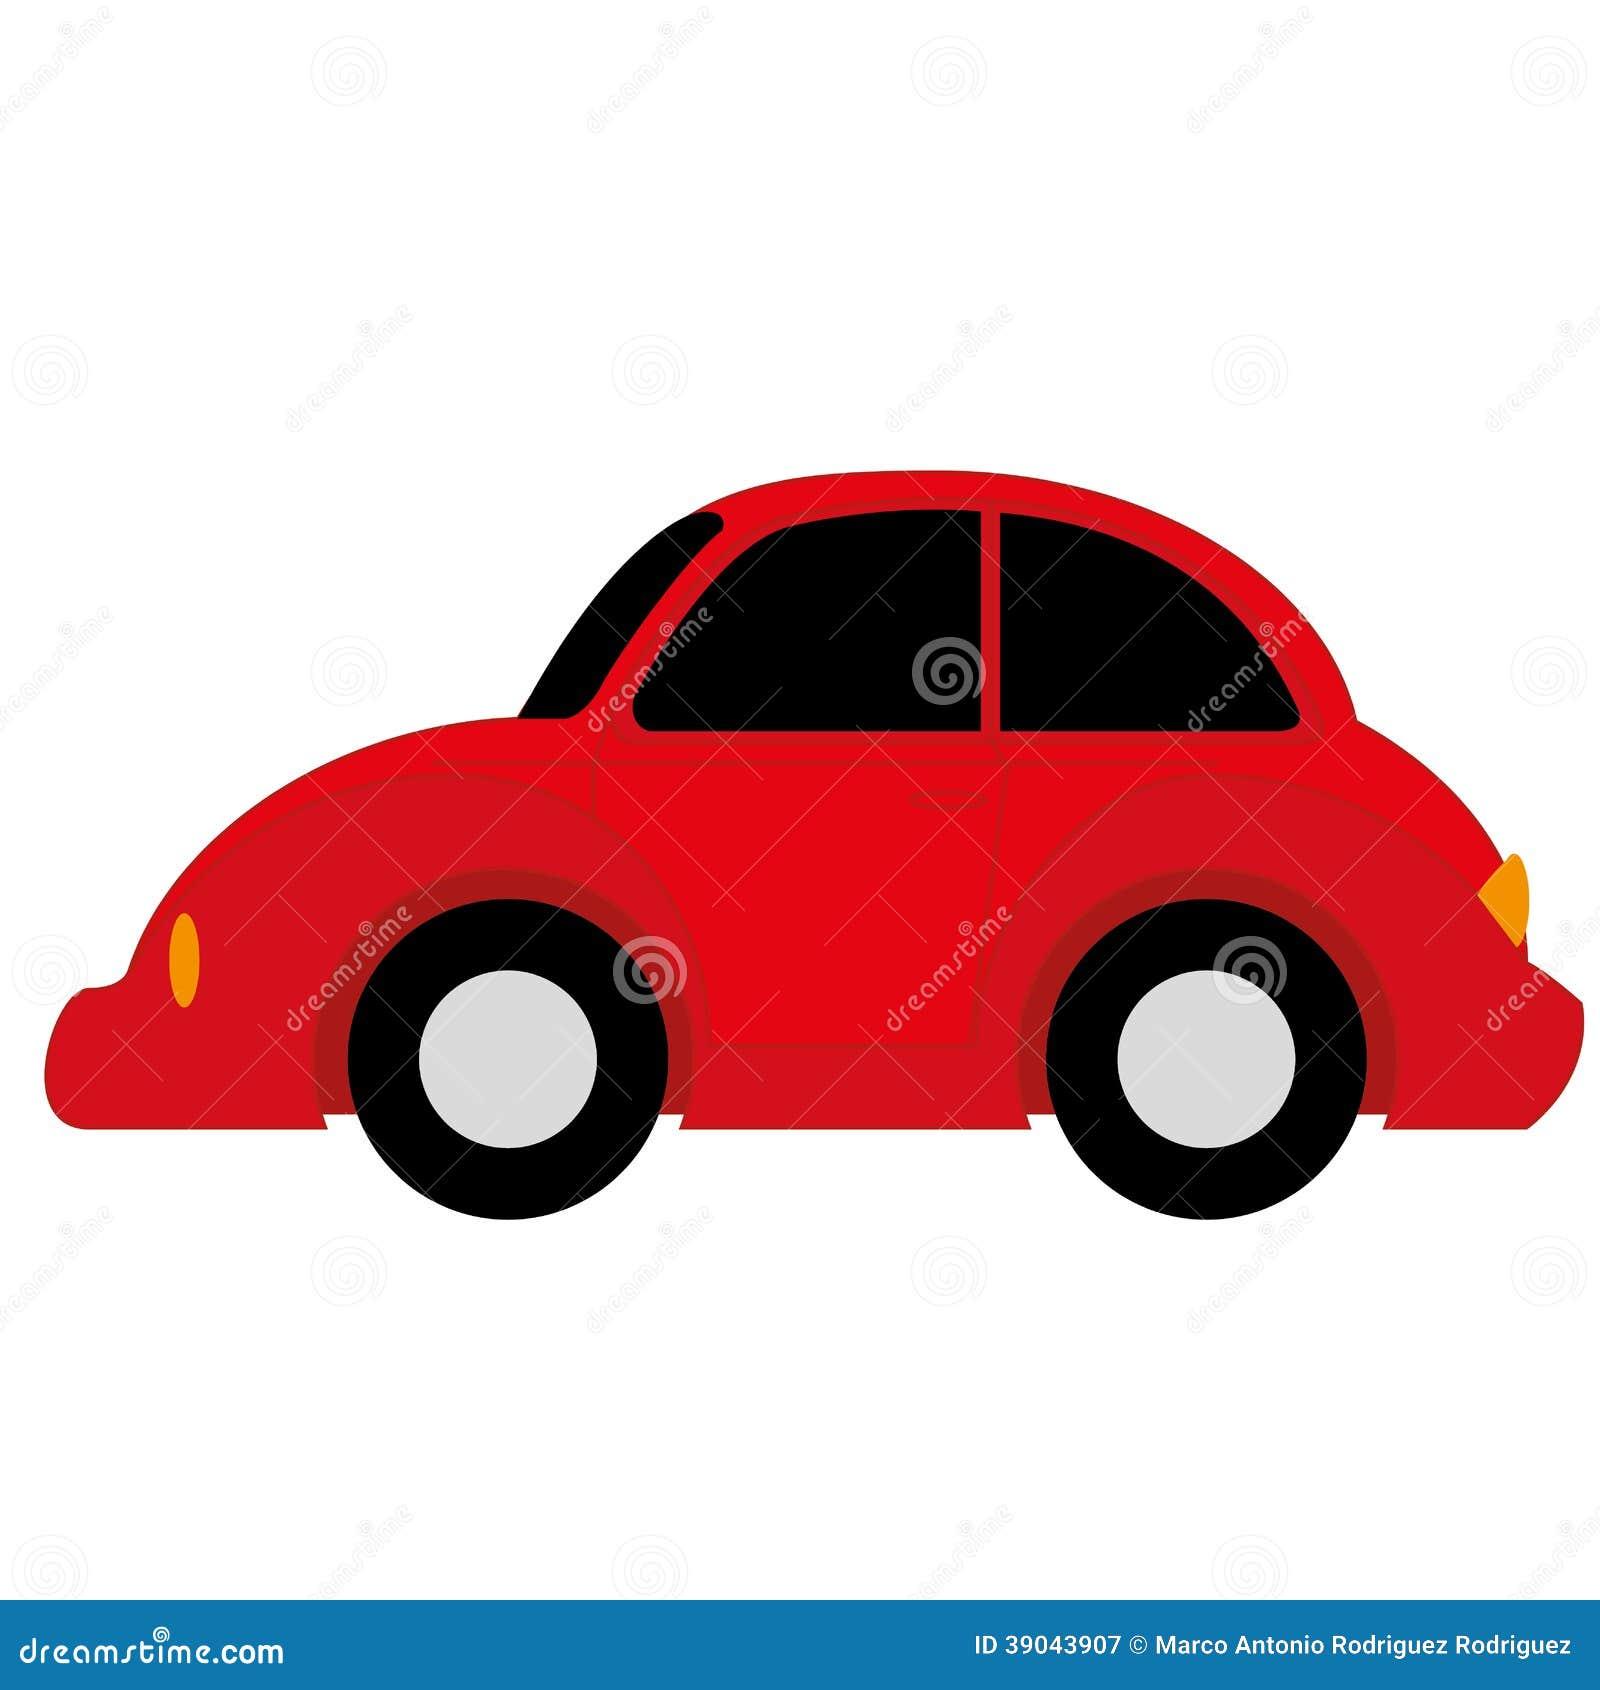 Vector Cartoon Simple Car Stock Vector - Image: 39043907